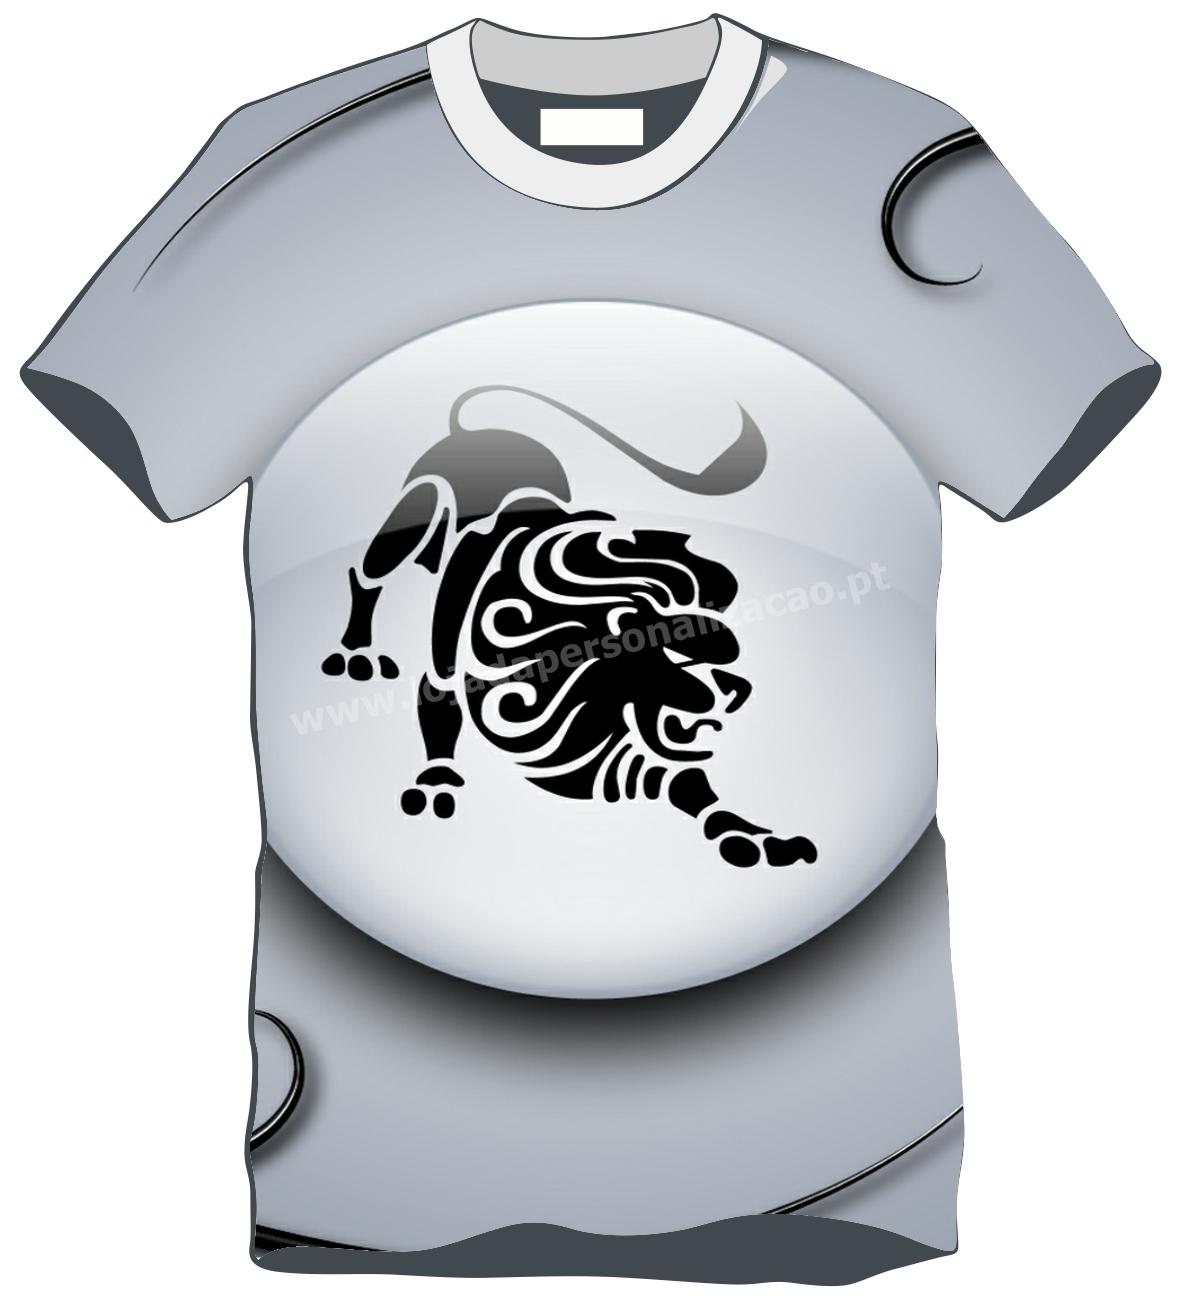 T-Shirt Signos (6)